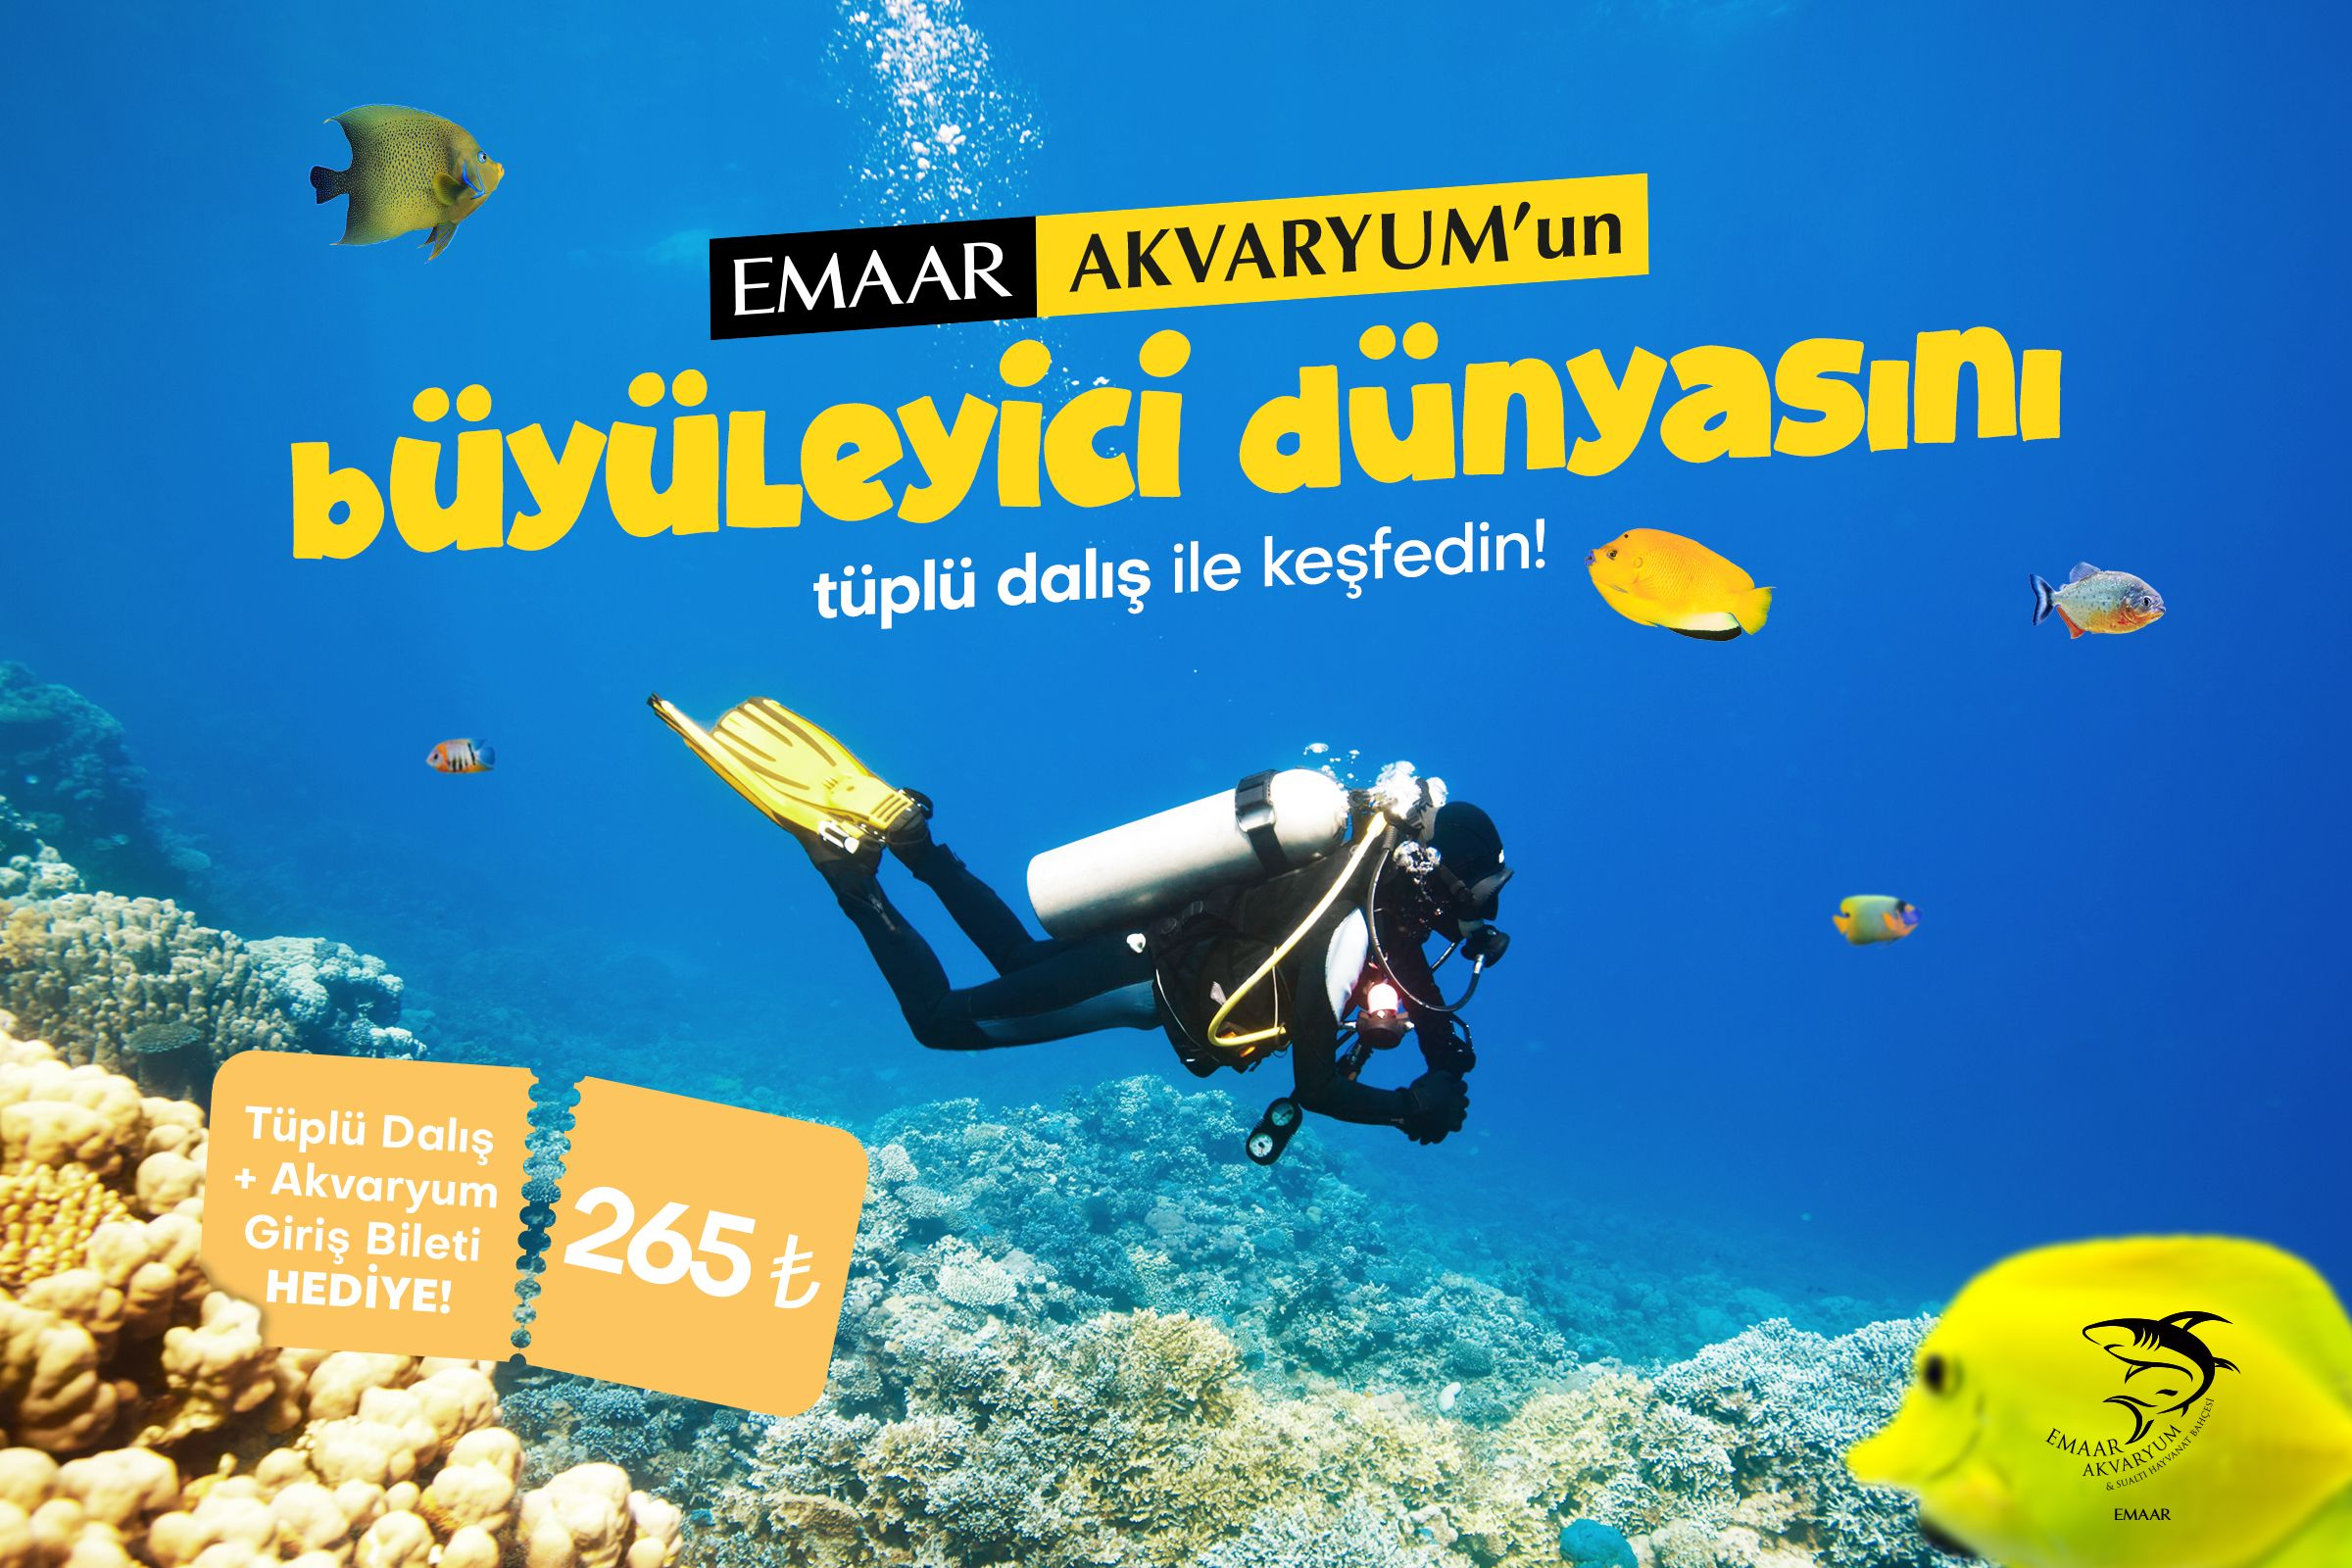 Emaar Aquarium & Underwater Zoo -